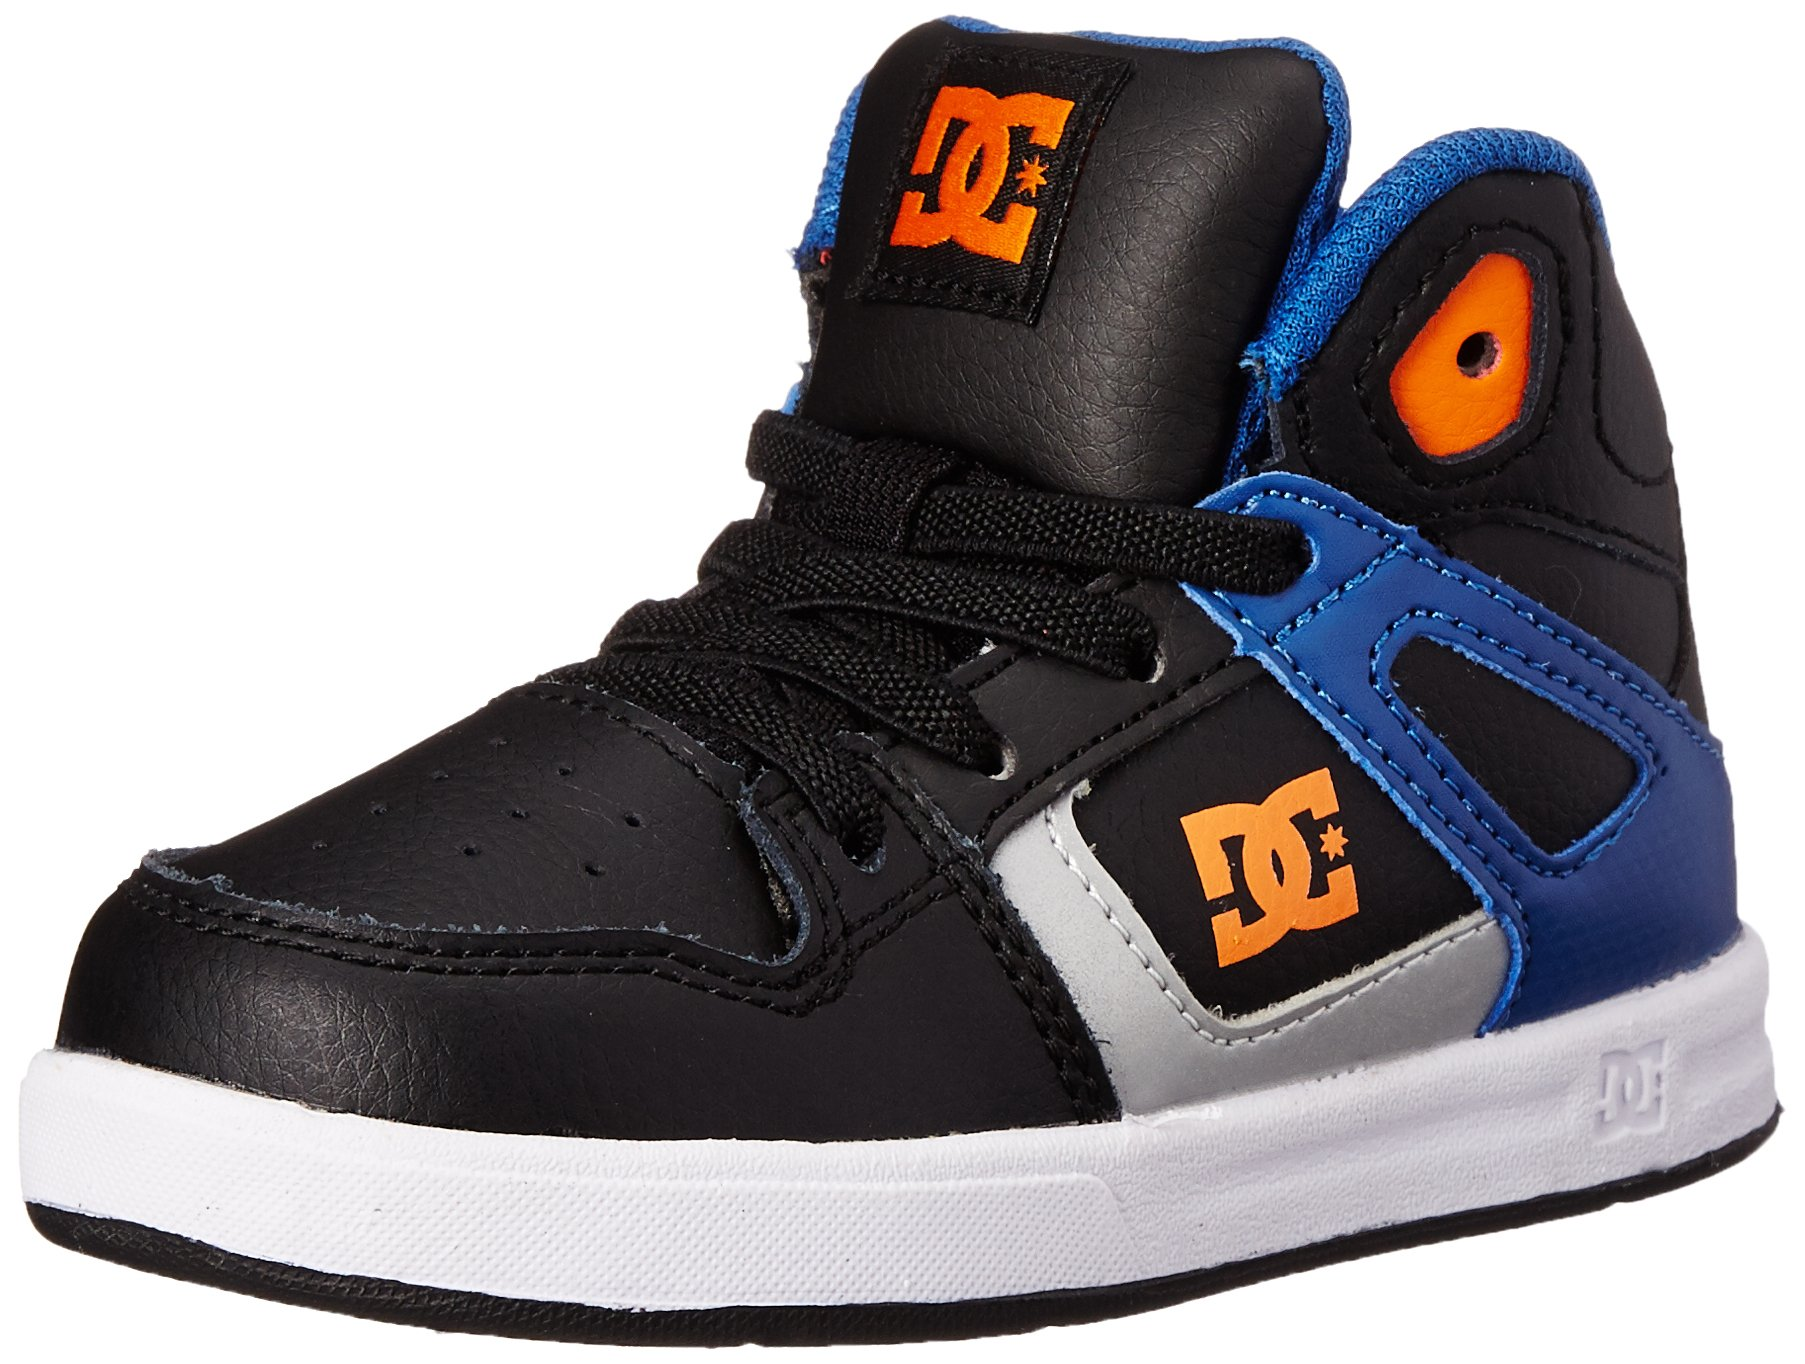 DC Shoes Baby-Boys Shoes Rebound Ul - High-Top Shoes - Boys - US 5 - Blue Blue/Black/White US 5 / UK 4 / EU 20.5